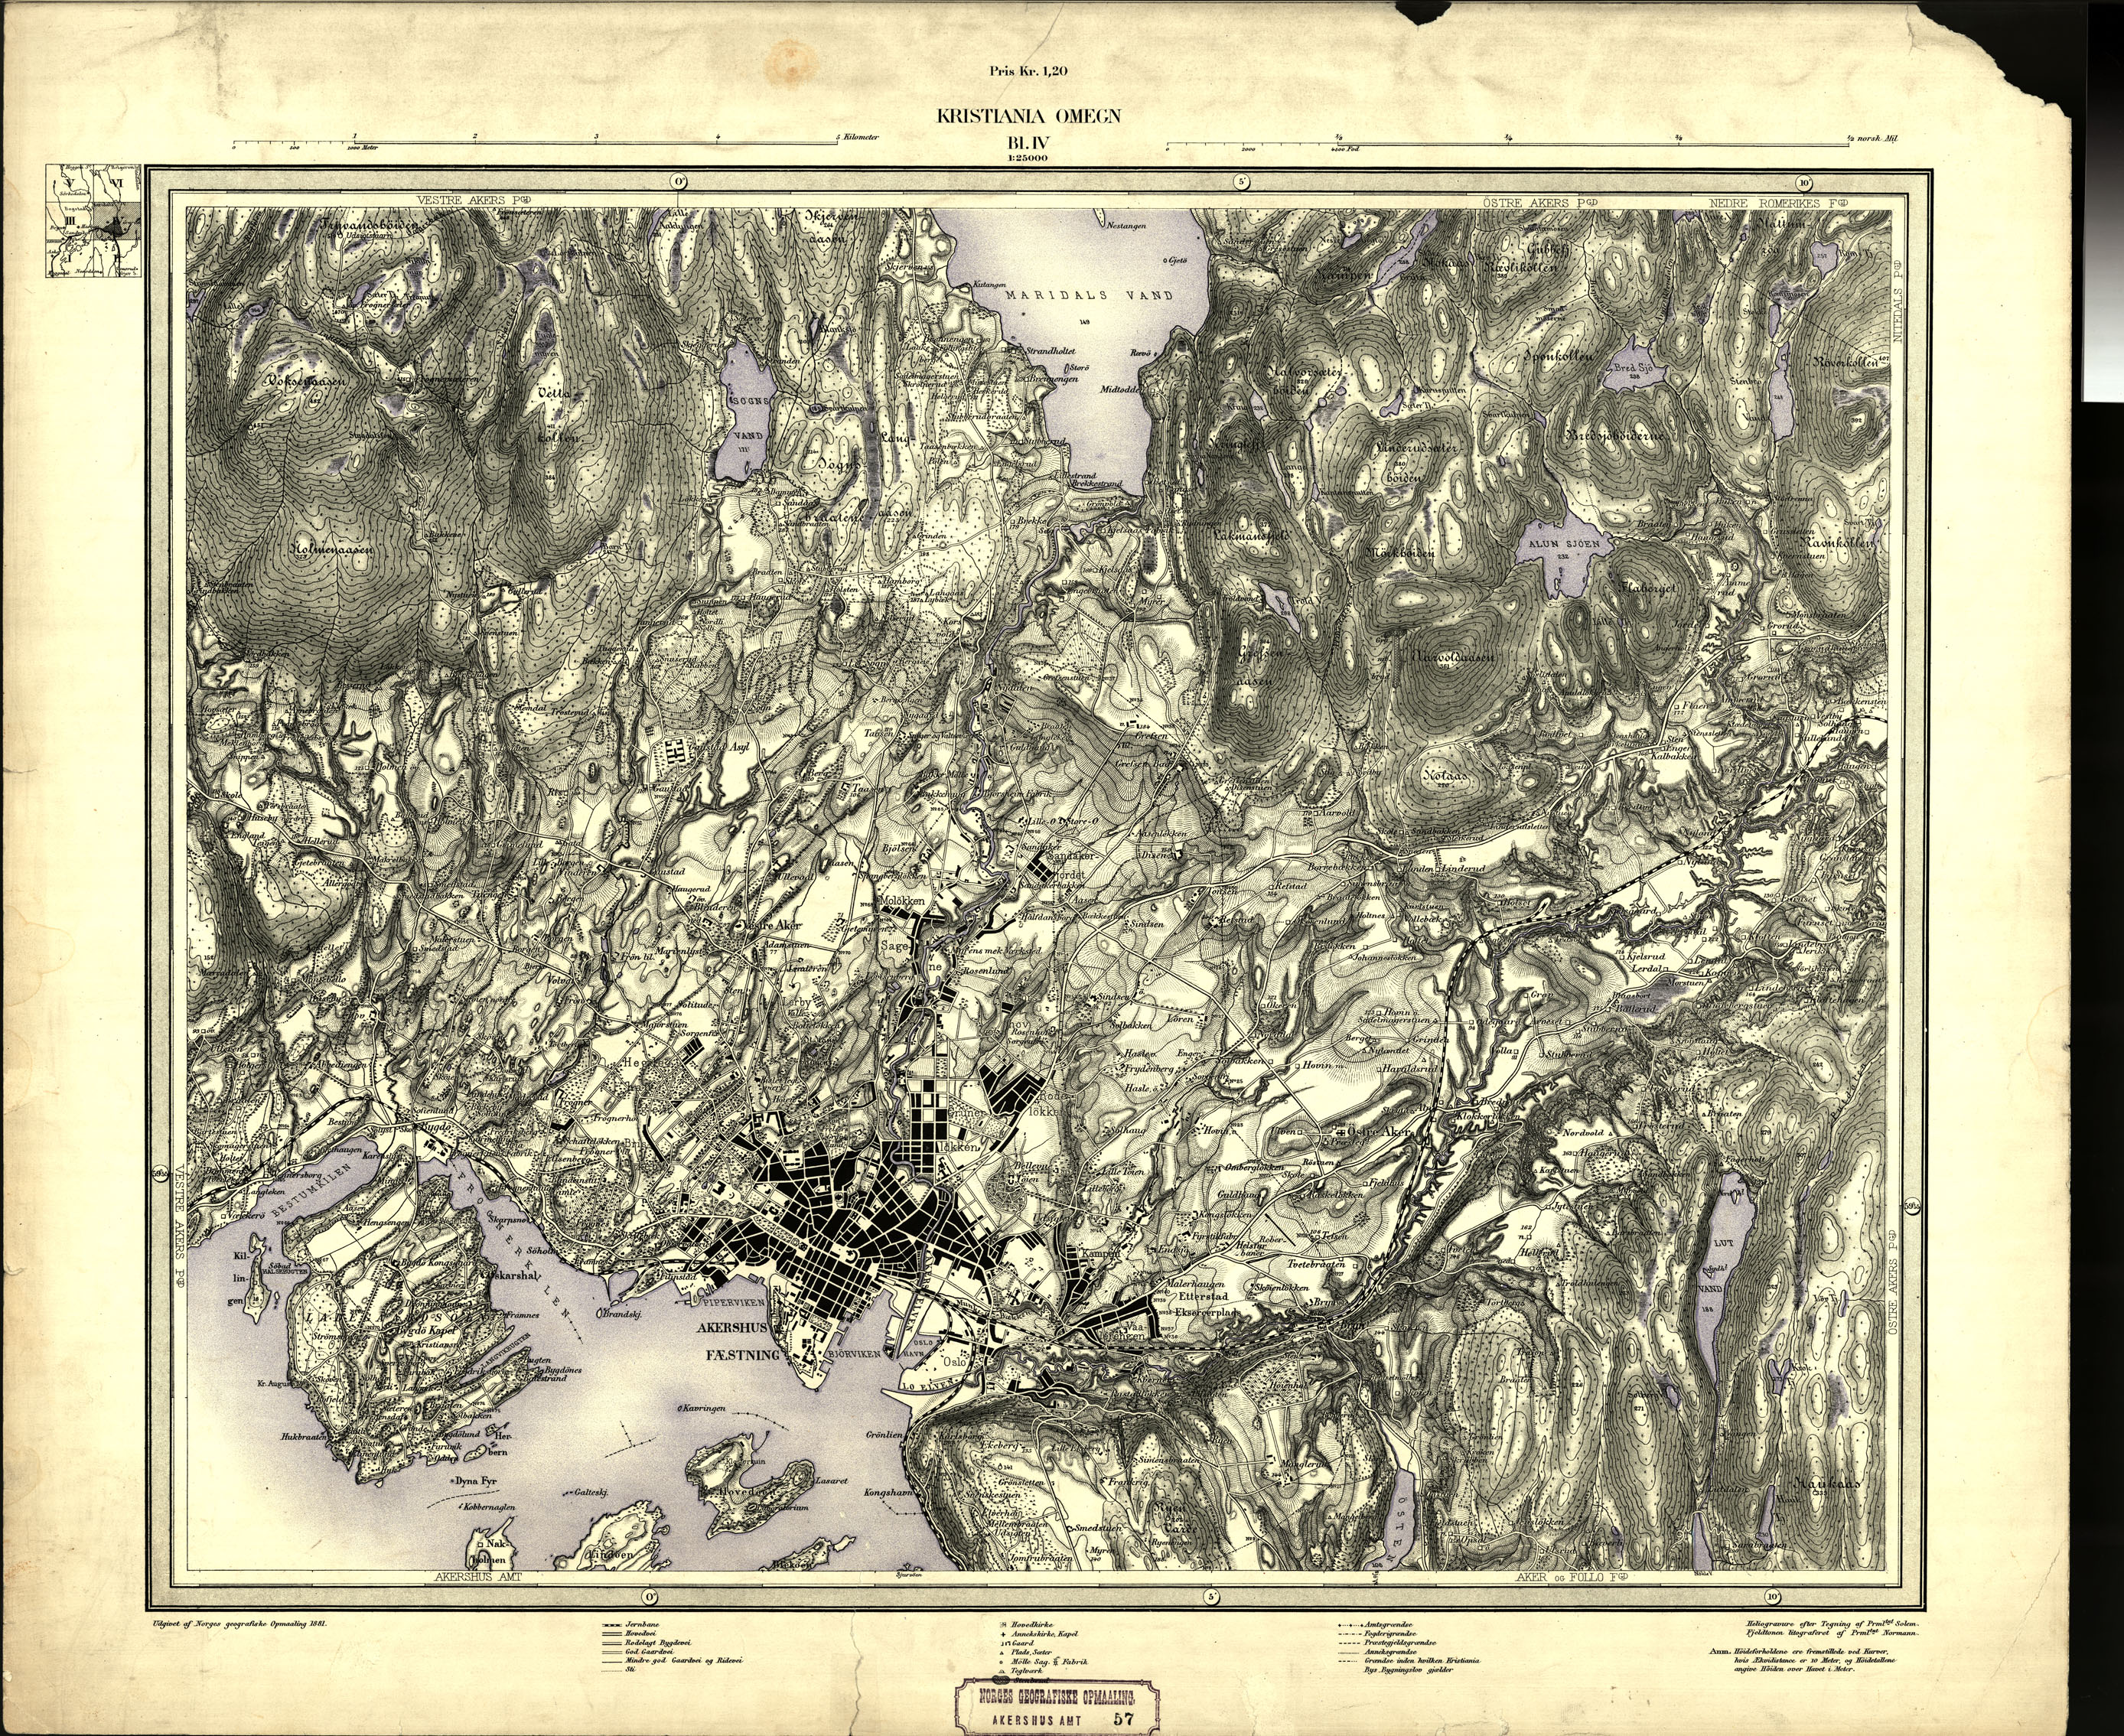 www 1881 kart Maridalens Venner : Kart fra 1881 og 1887 fra Norges Geografiske  www 1881 kart